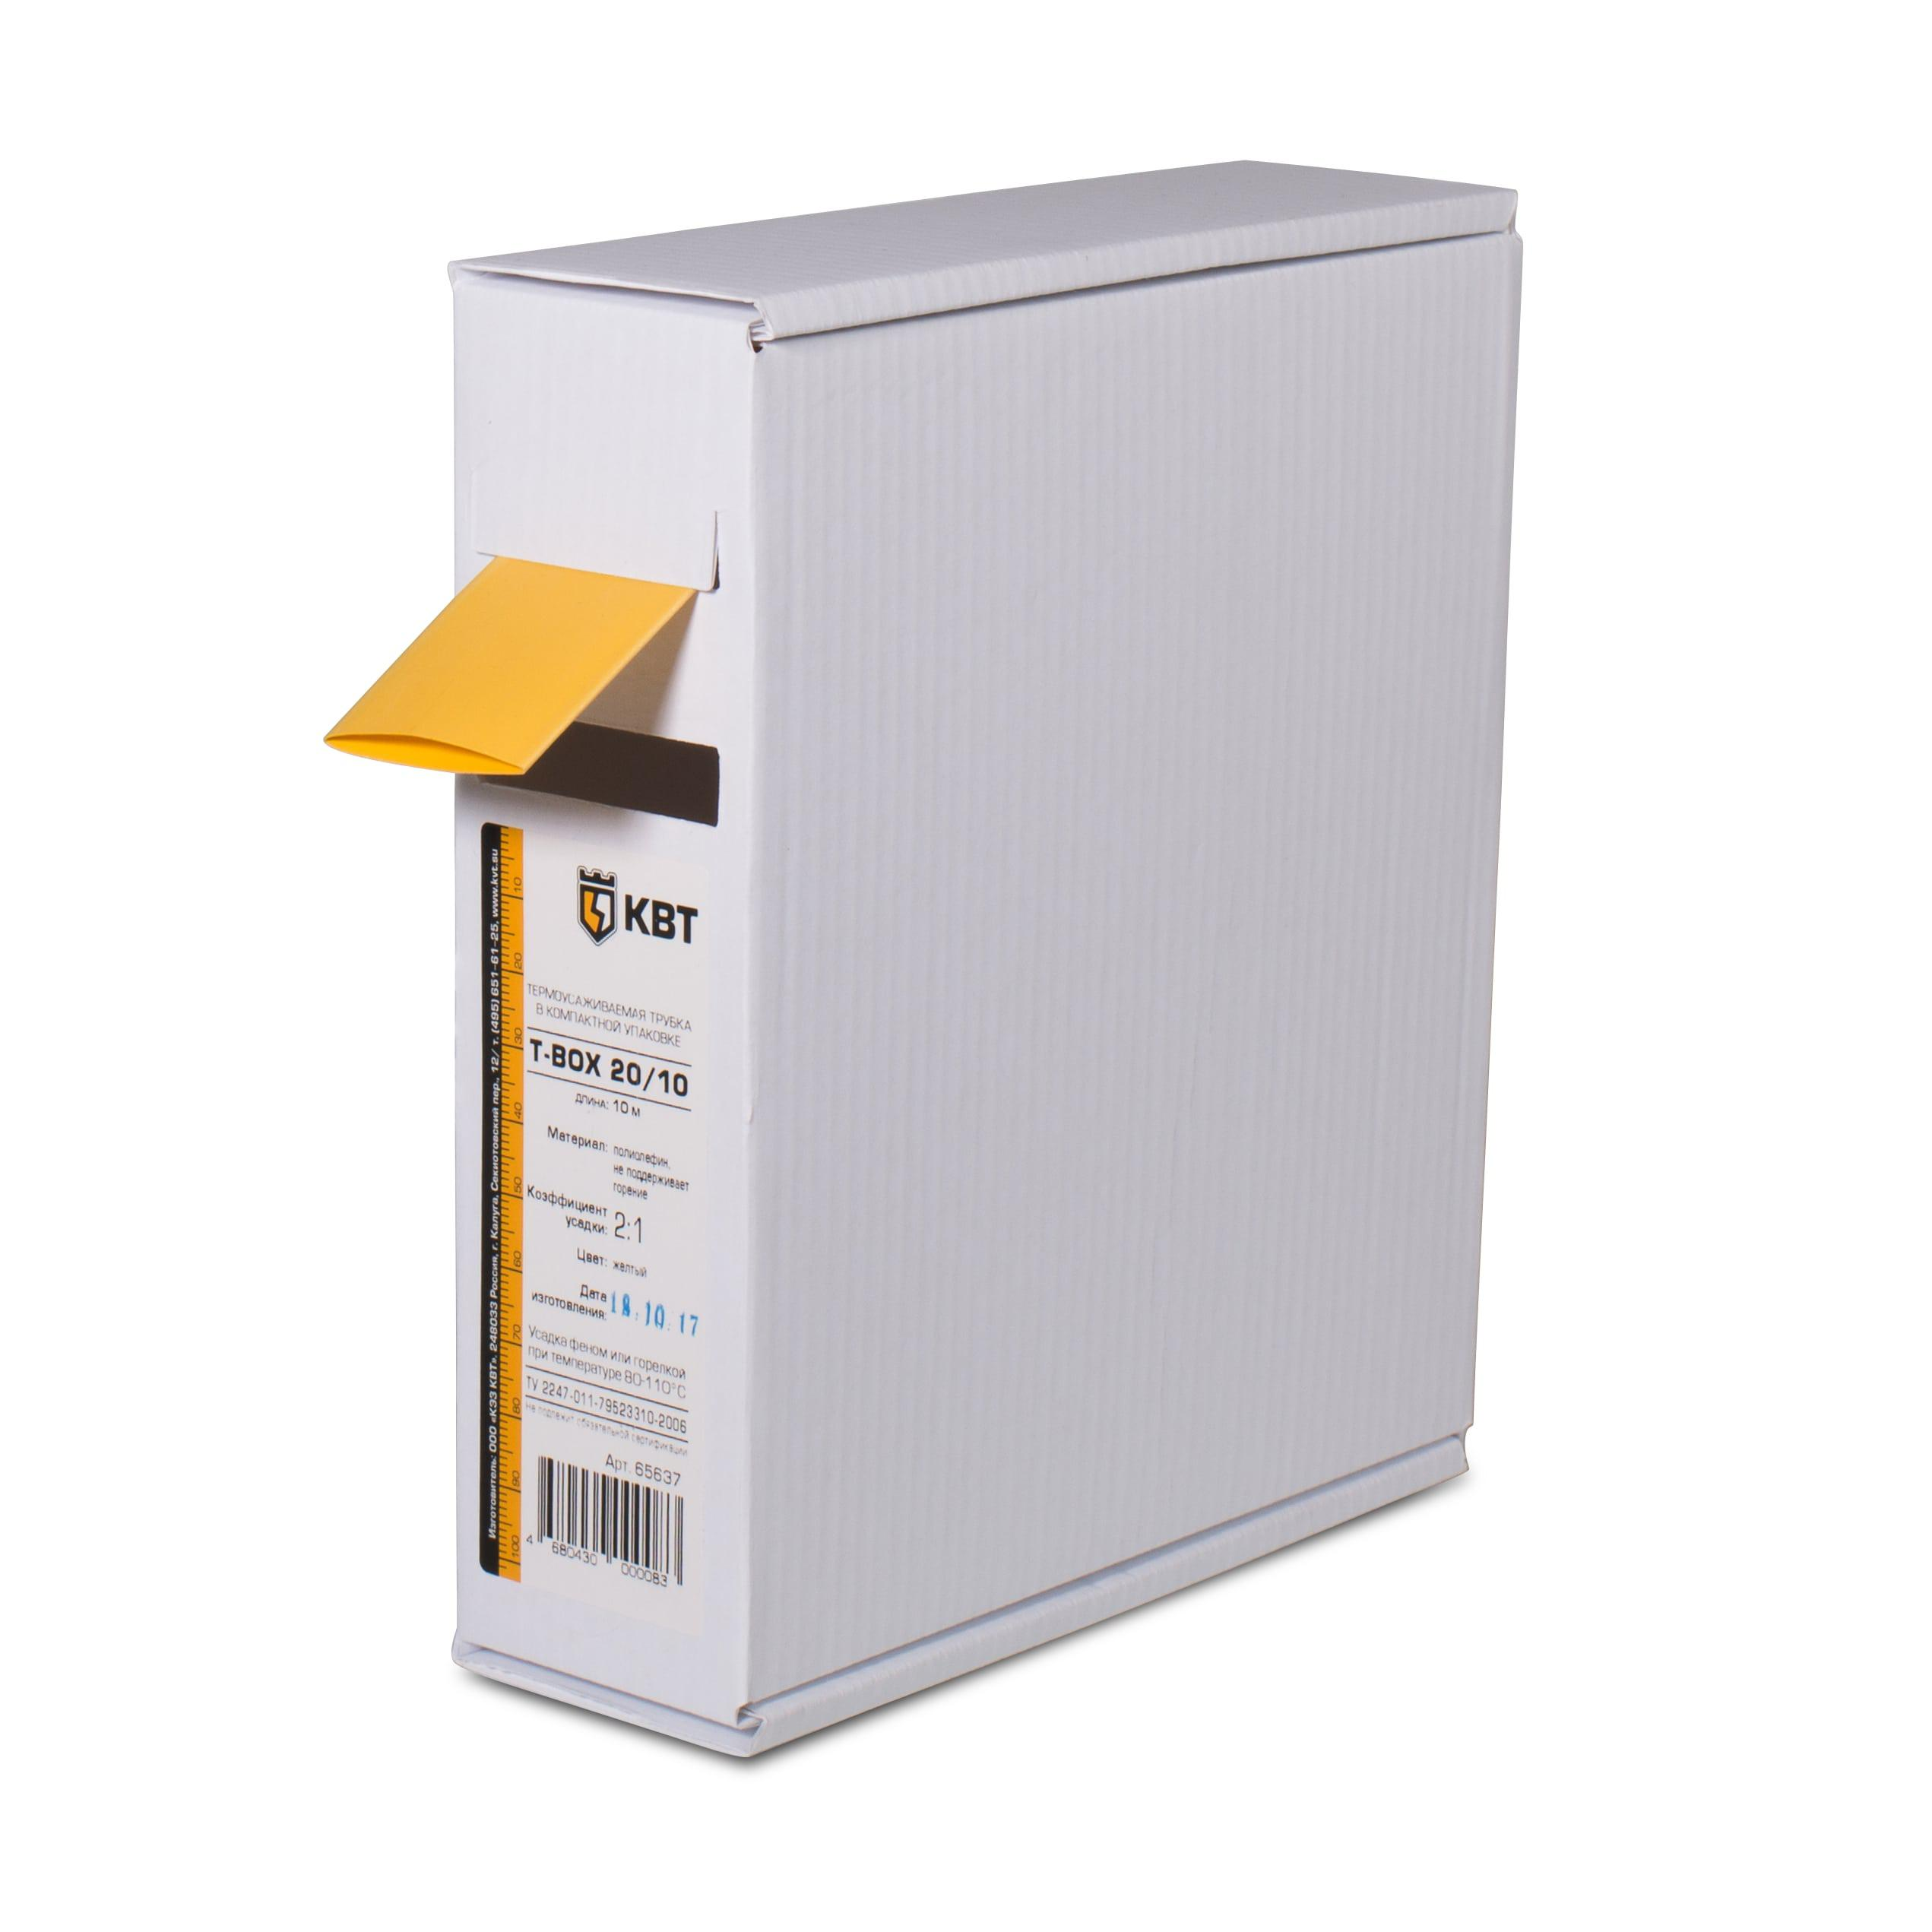 Термоусадочная трубка КВТ Т-box-6/3 желт 10м